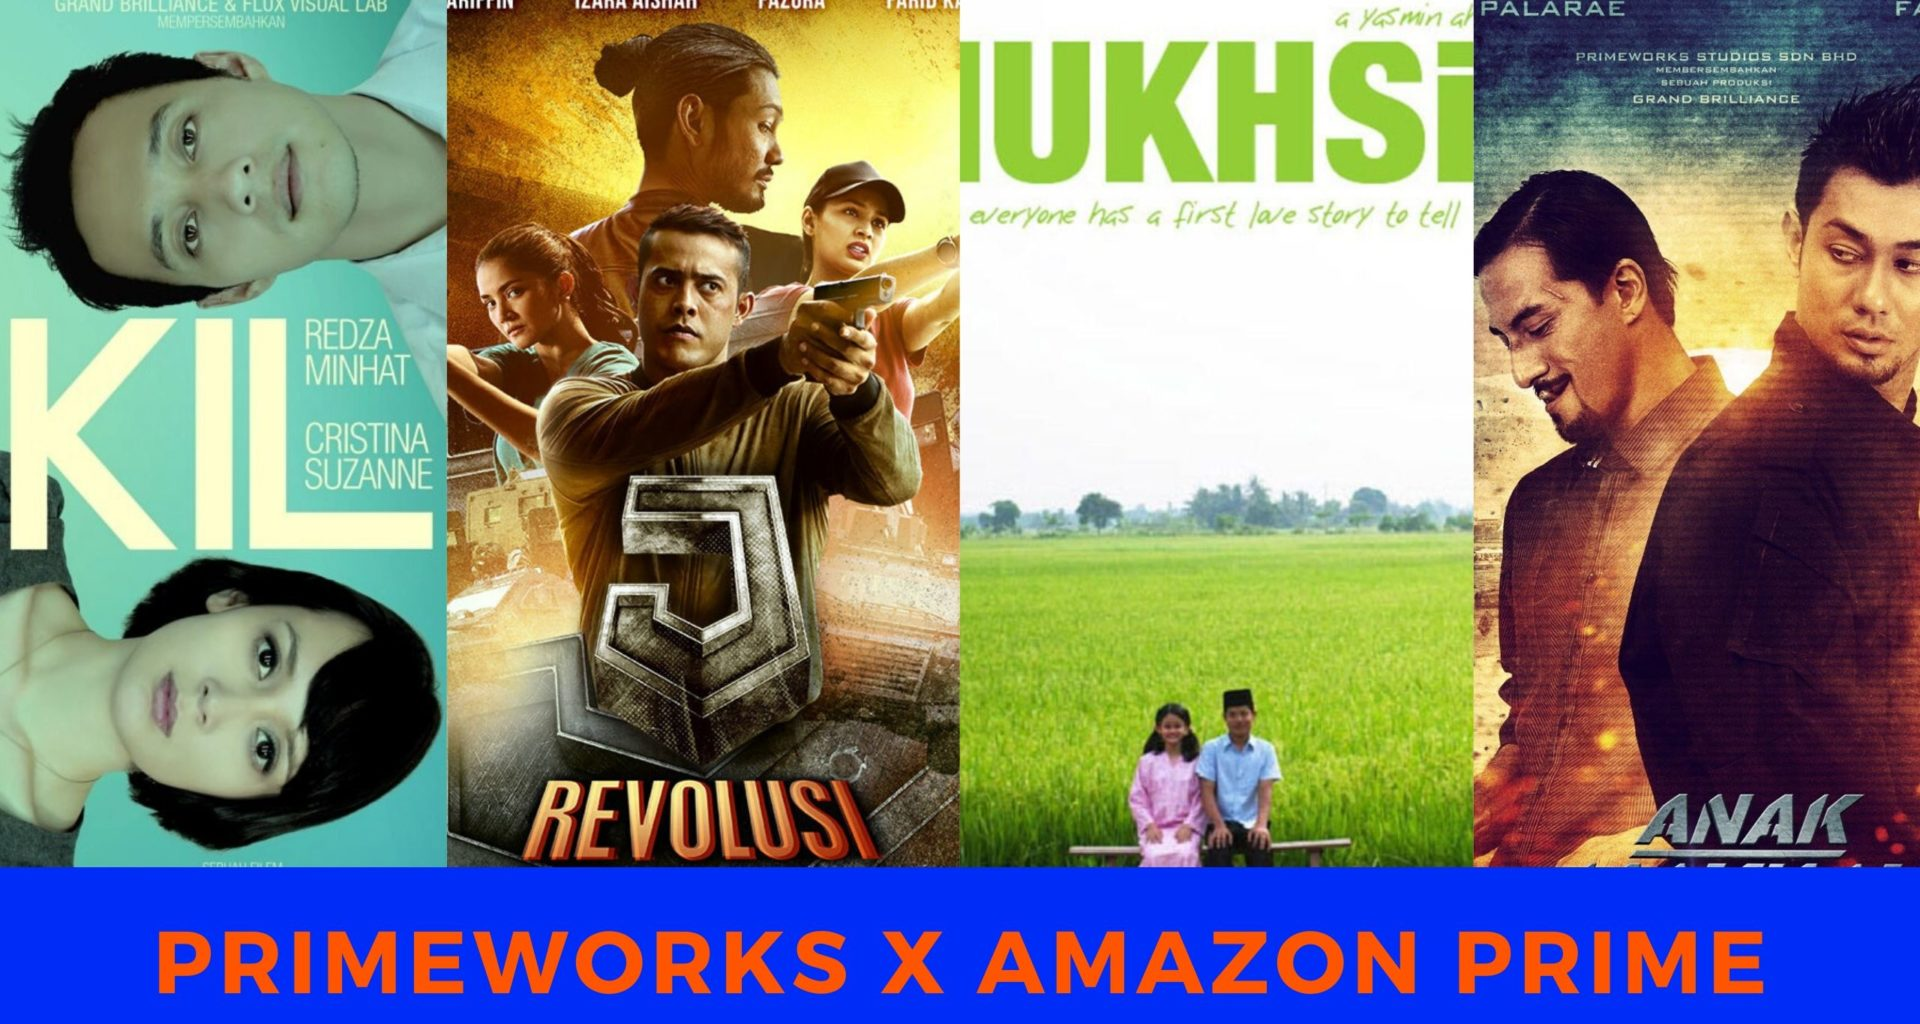 Primeworks Distribution x Amazon Prime Video collabo